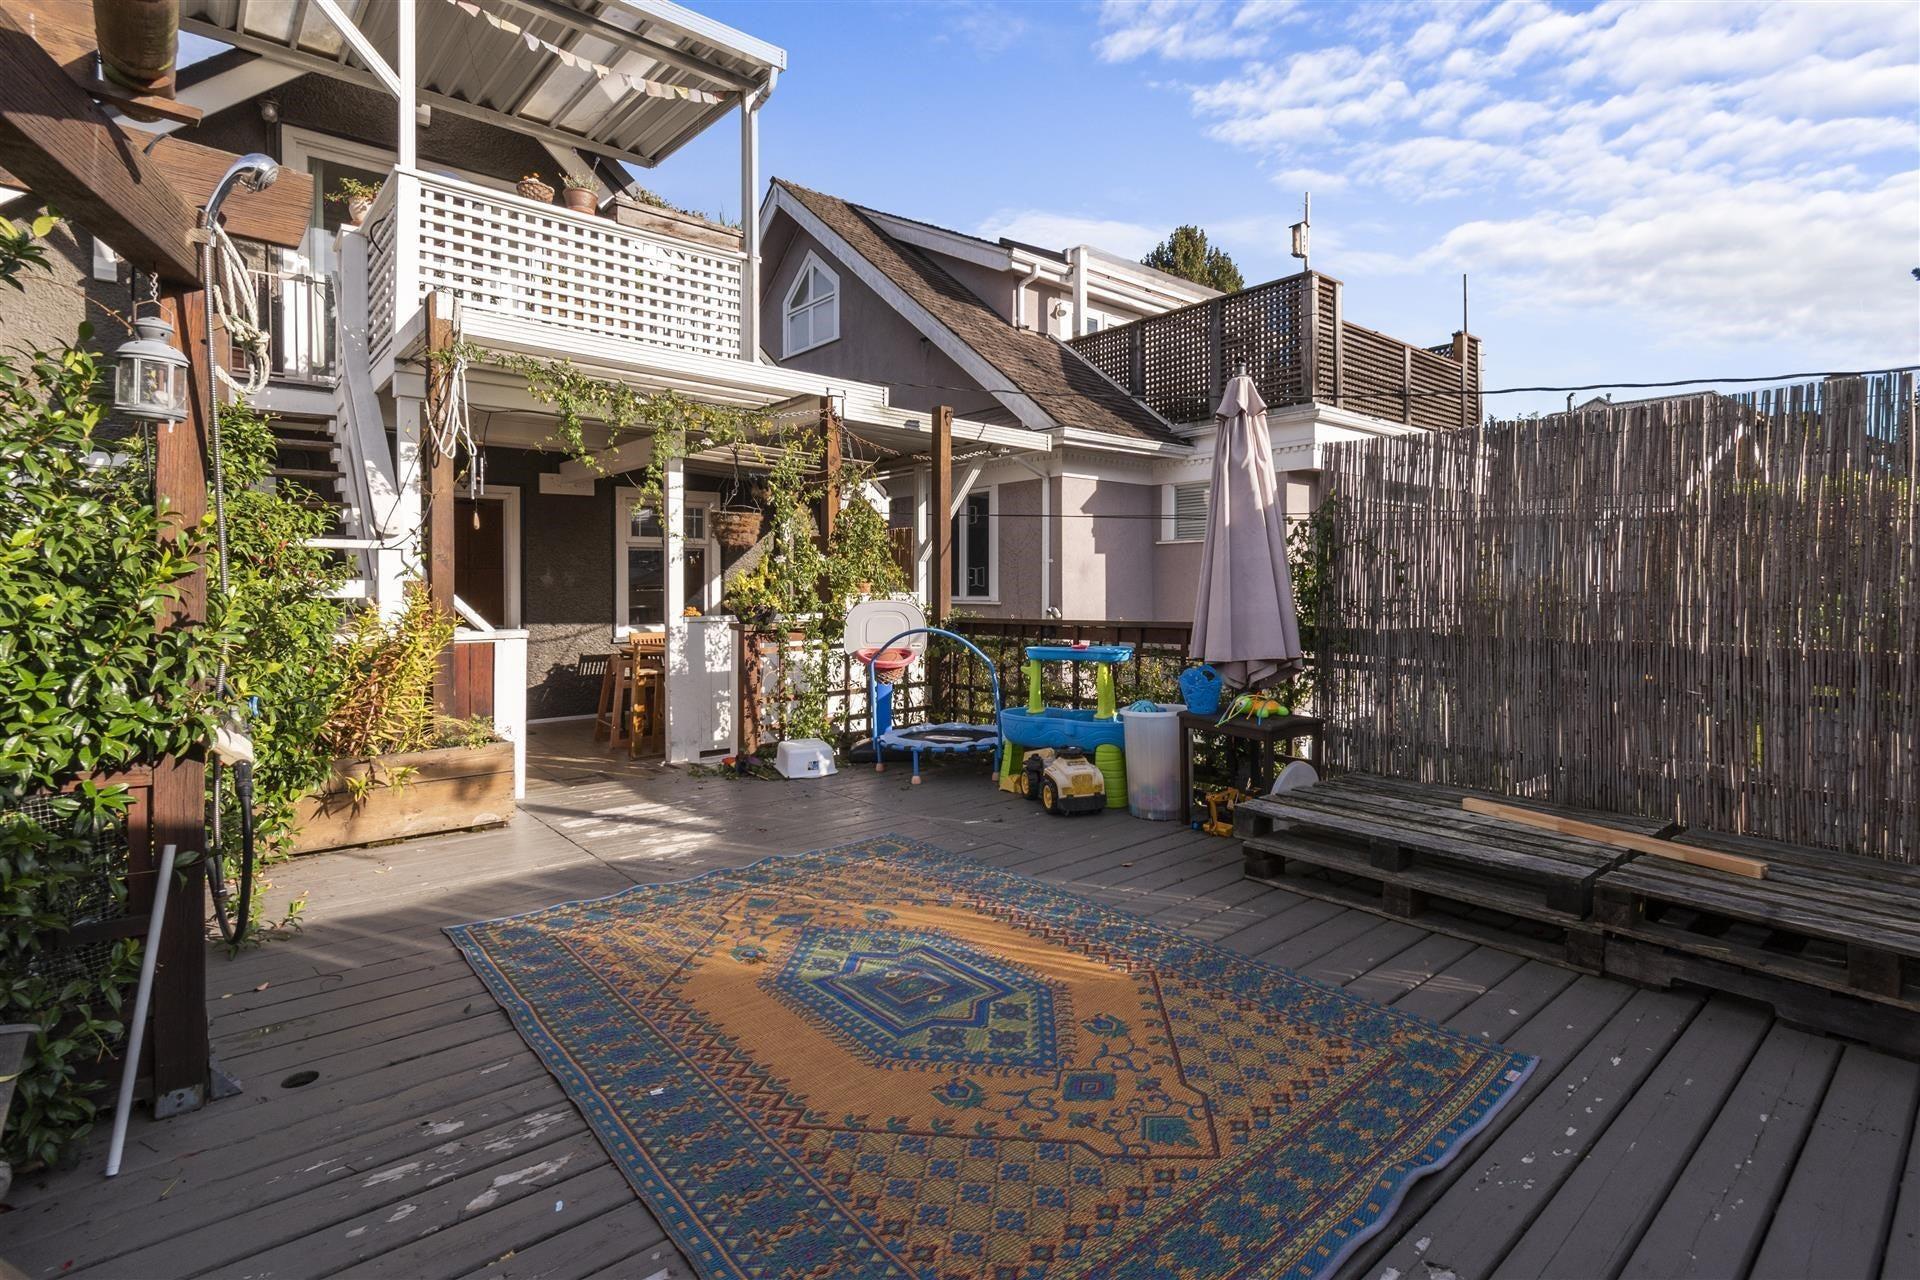 1335 LABURNUM STREET - Kitsilano House/Single Family for sale, 4 Bedrooms (R2617723) - #19